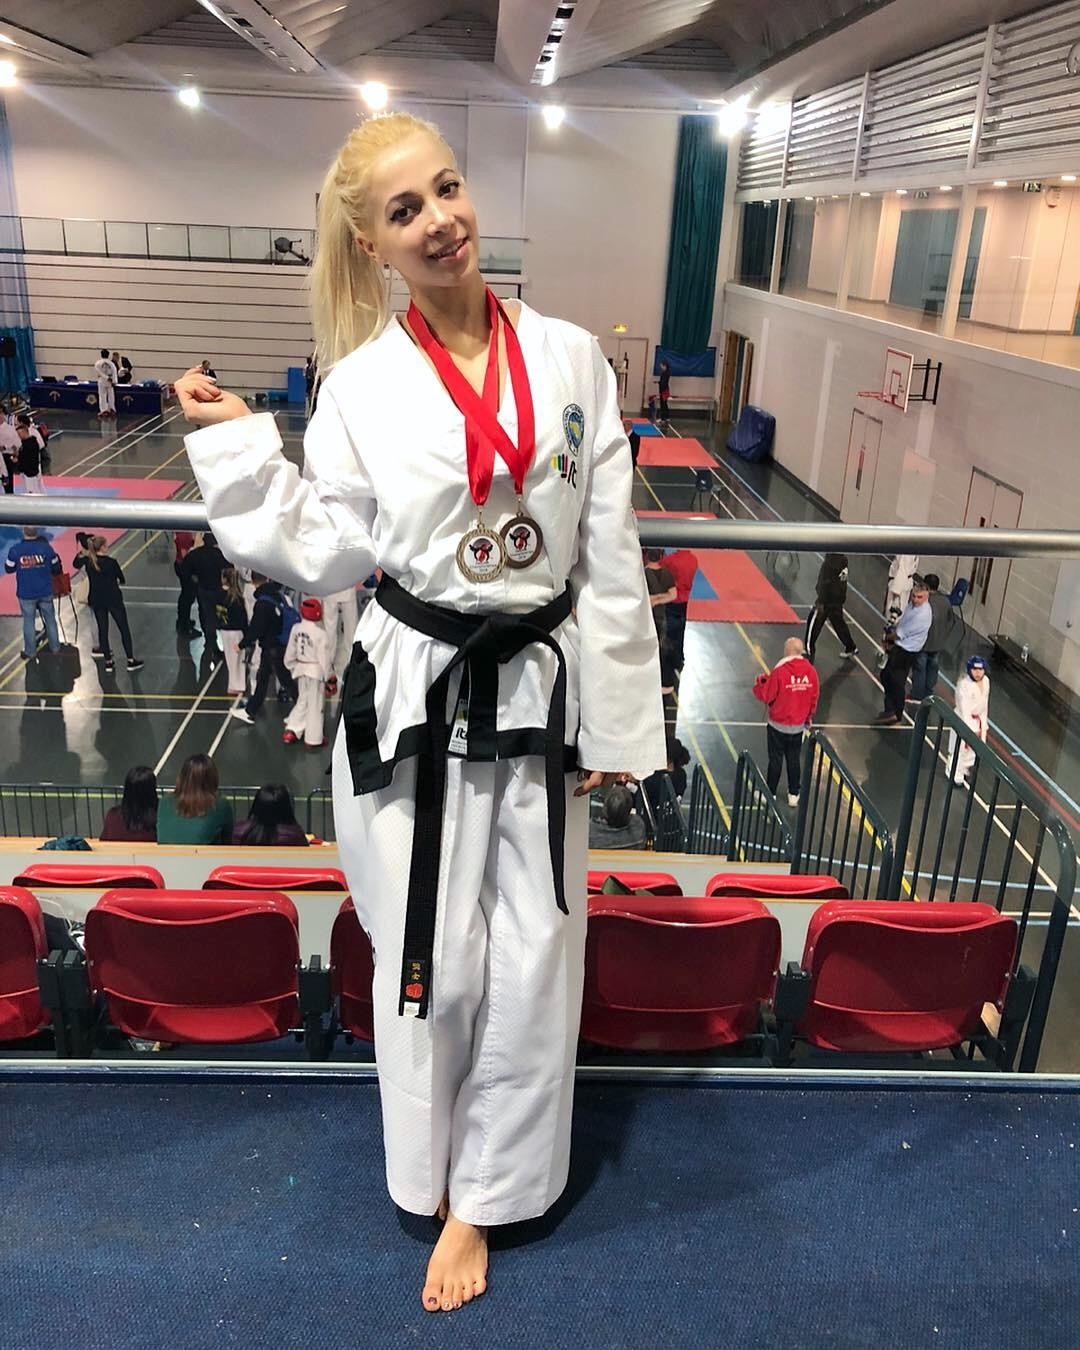 Lilly-Iaschelcic-taekwondo-fashion